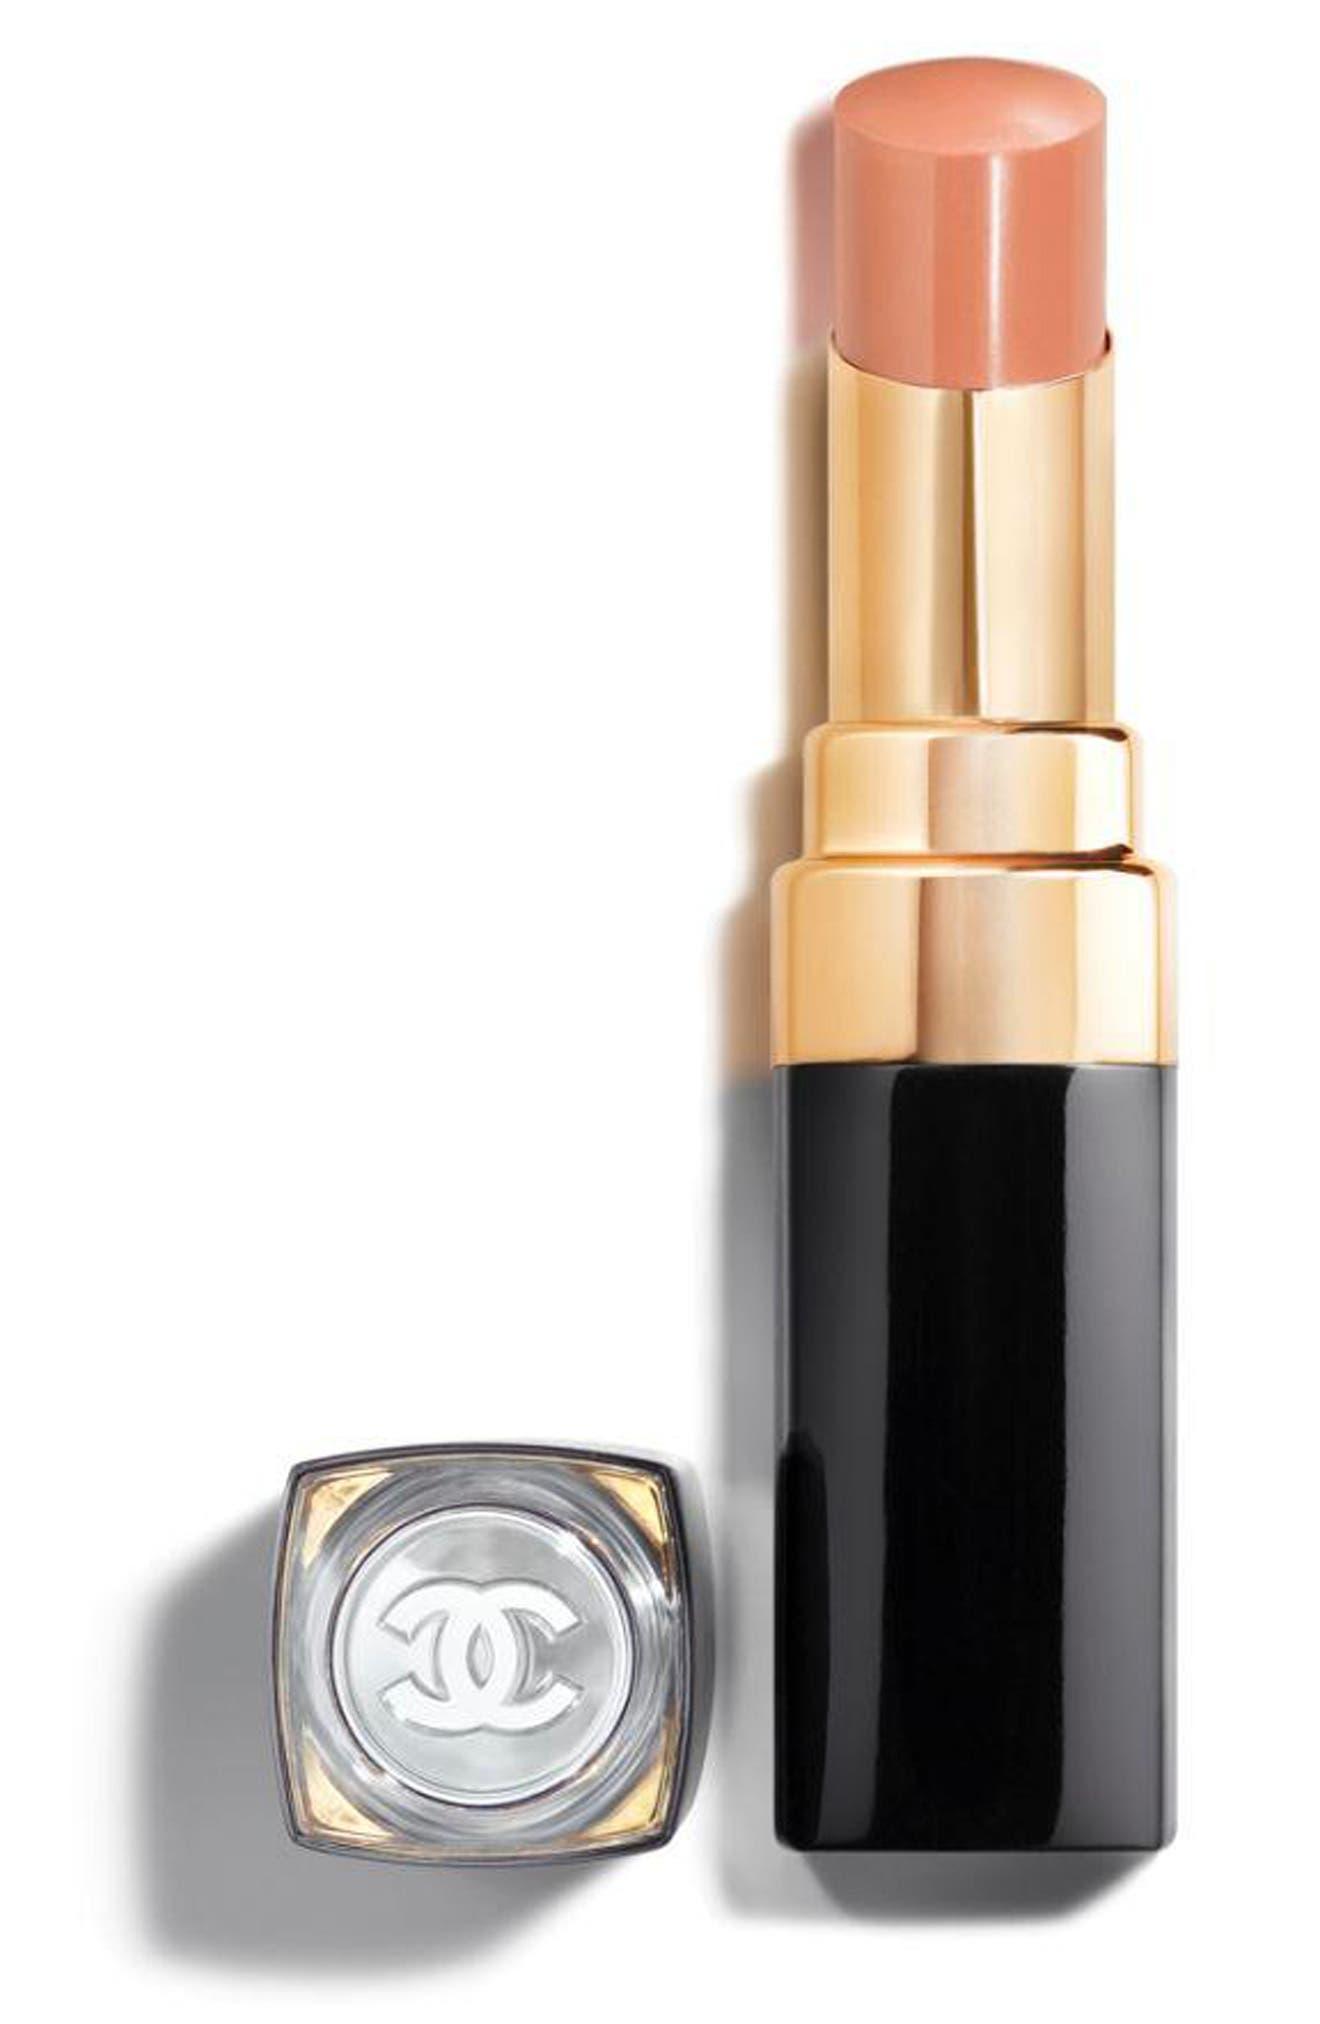 CHANEL ROUGE COCO FLASH<br />Lipstick, Main, color, 52 CASUAL